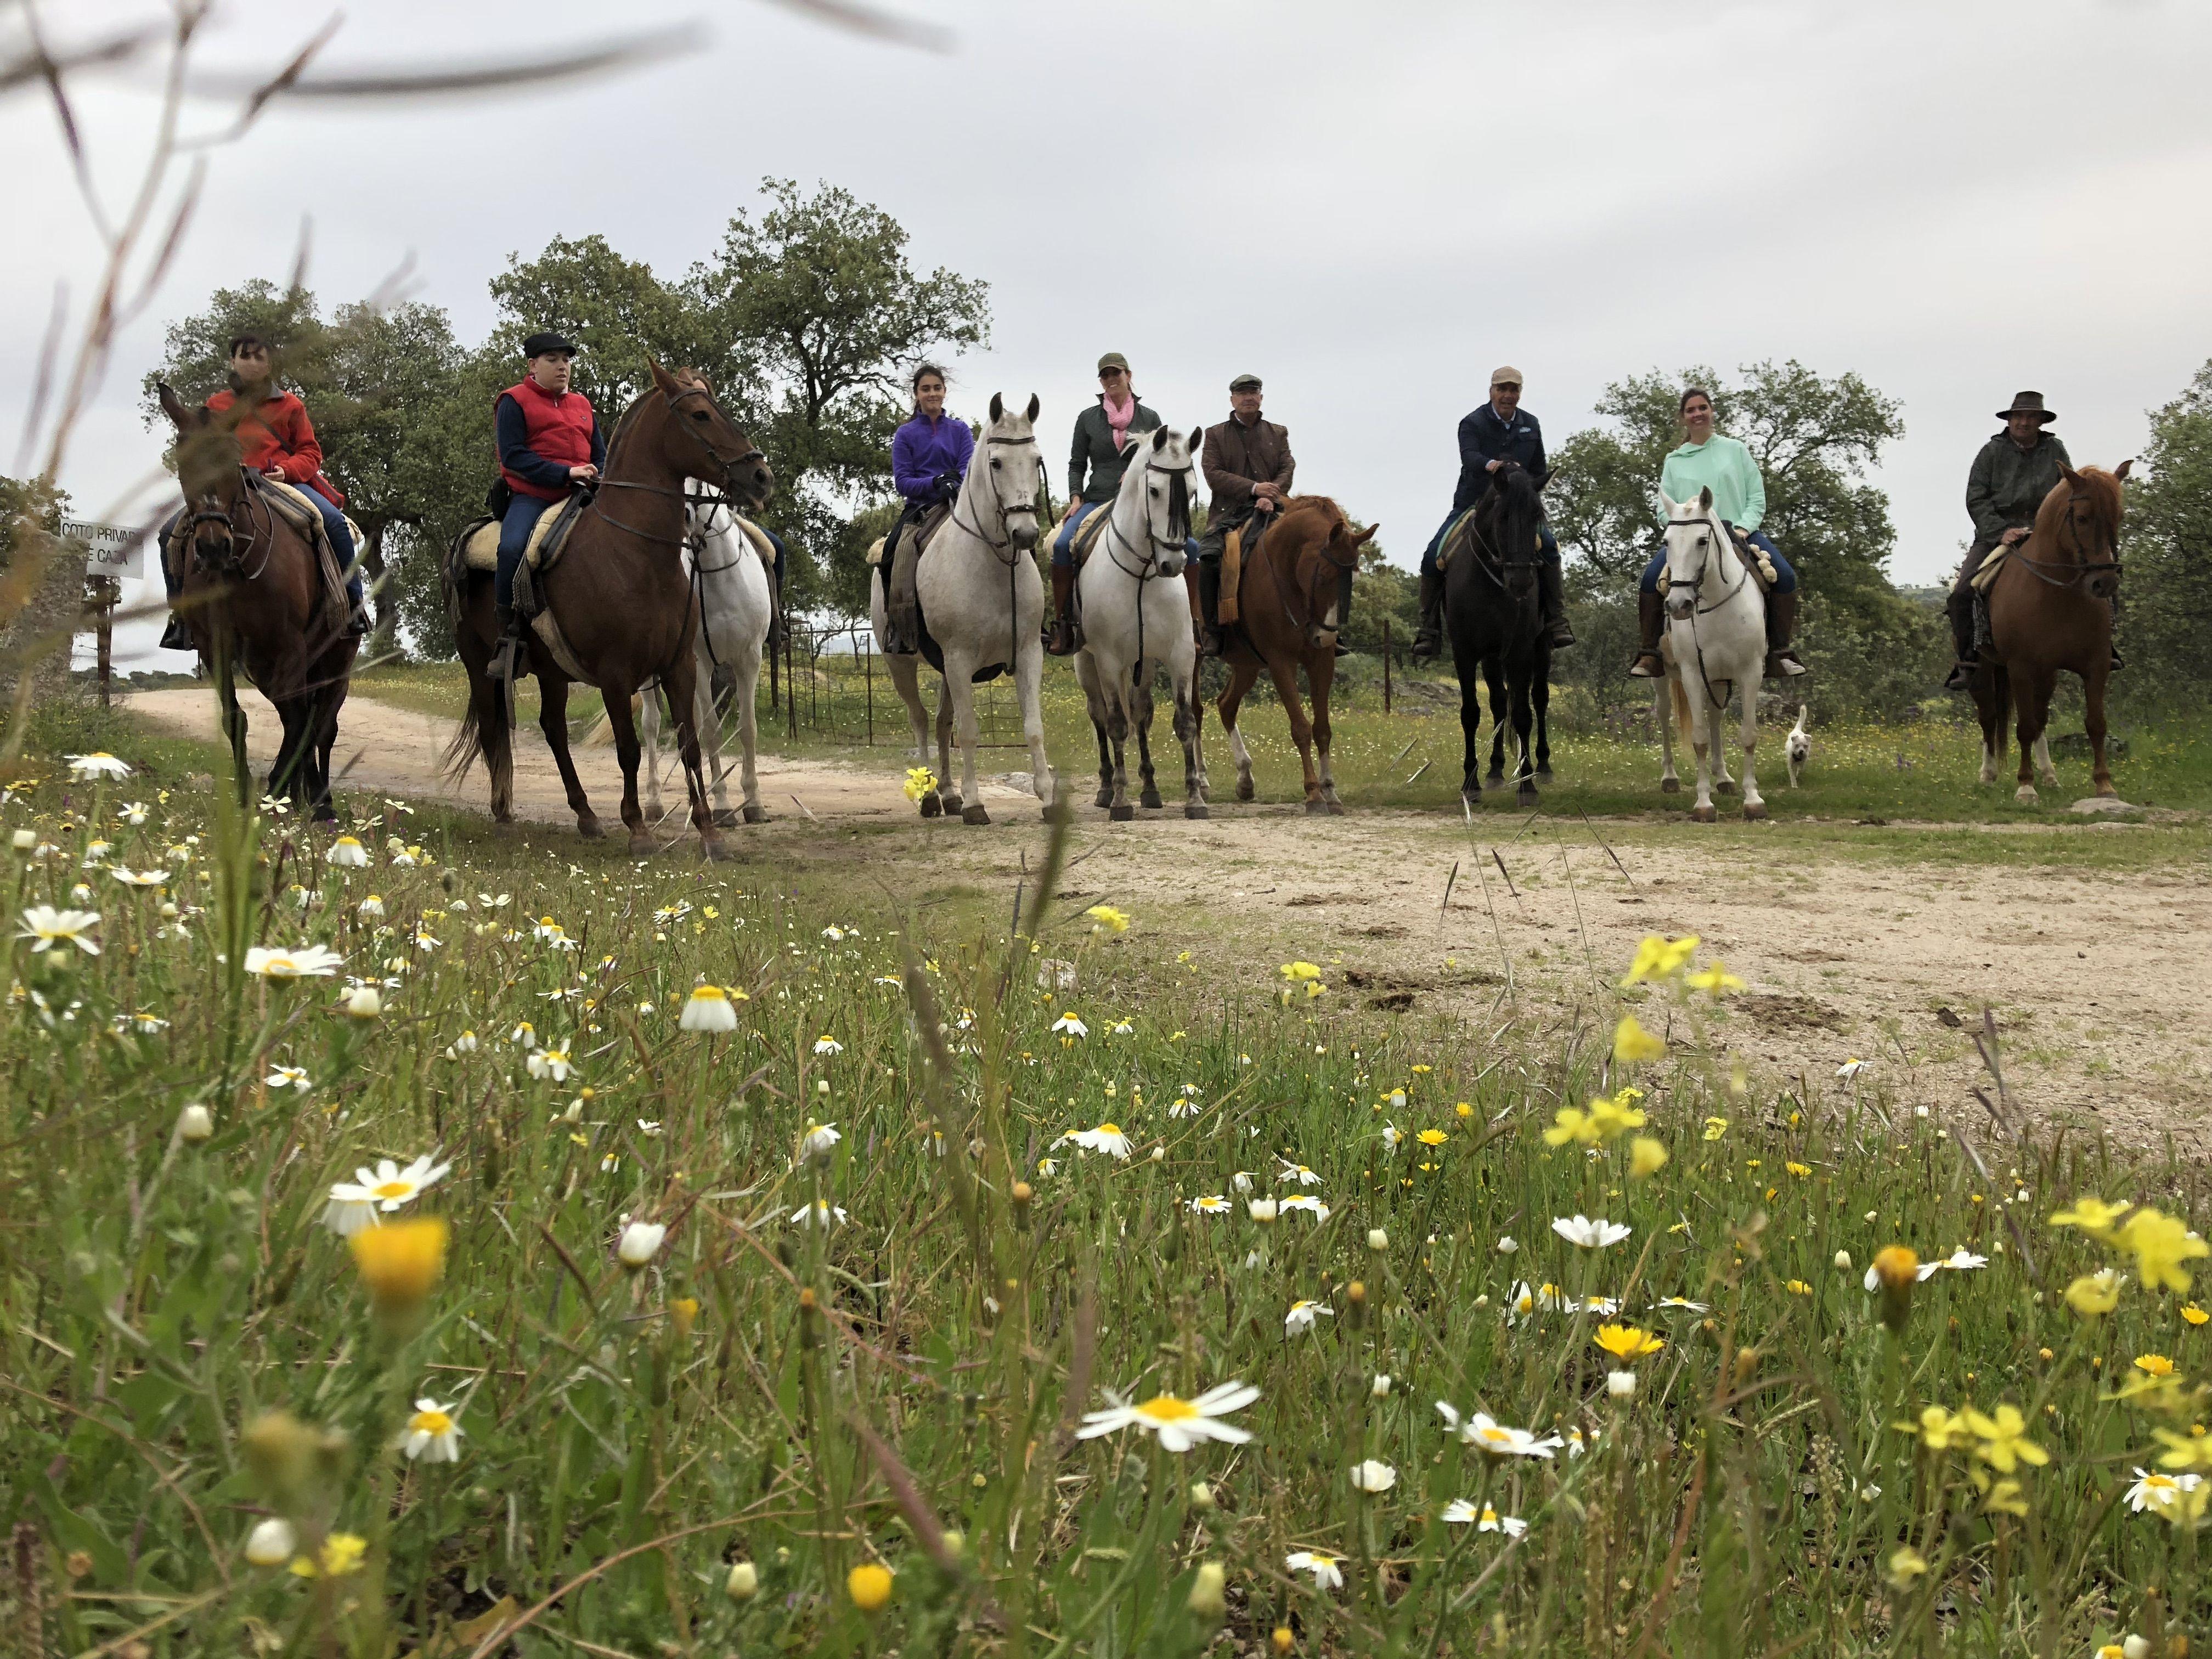 Rutas a caballo: Servicios de Picadero Escuela Las Cruces